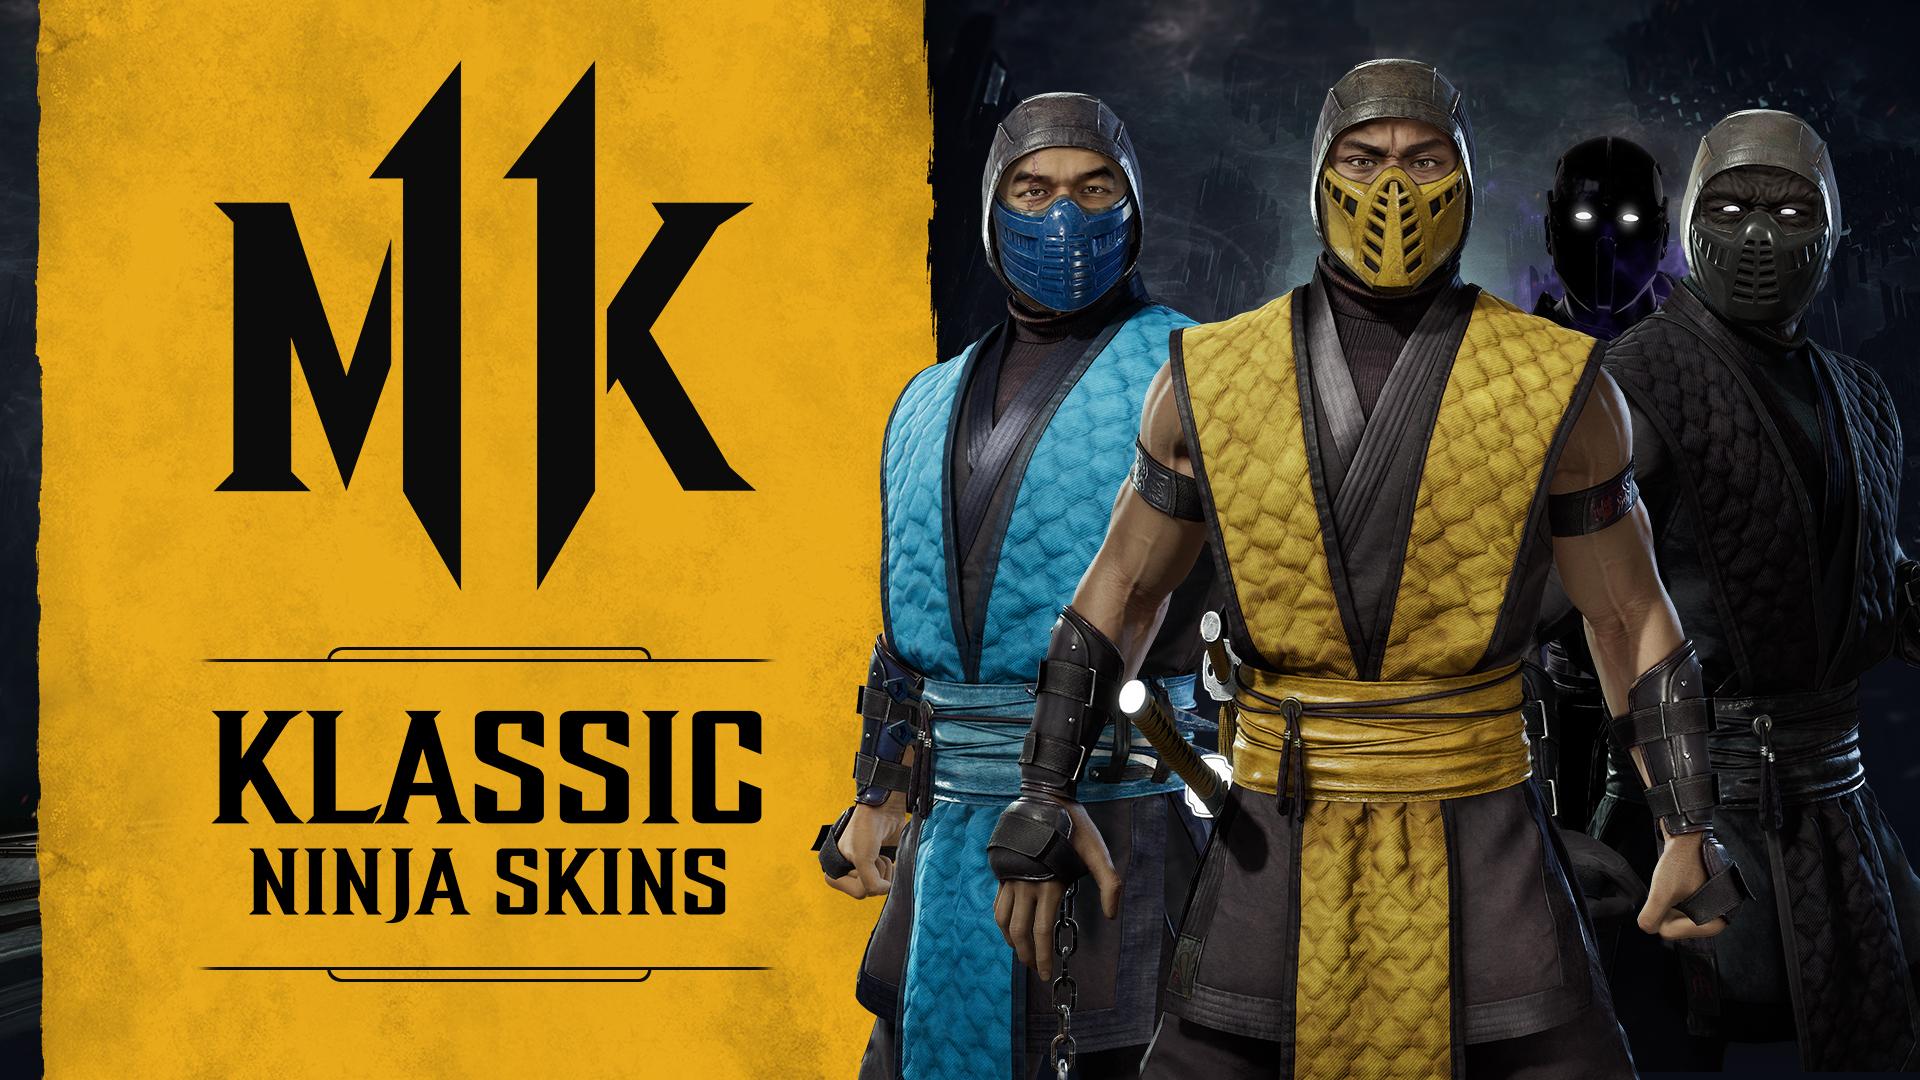 Klassic Arcade Ninja Skin Pack 1 Nintendo Switch Nintendo